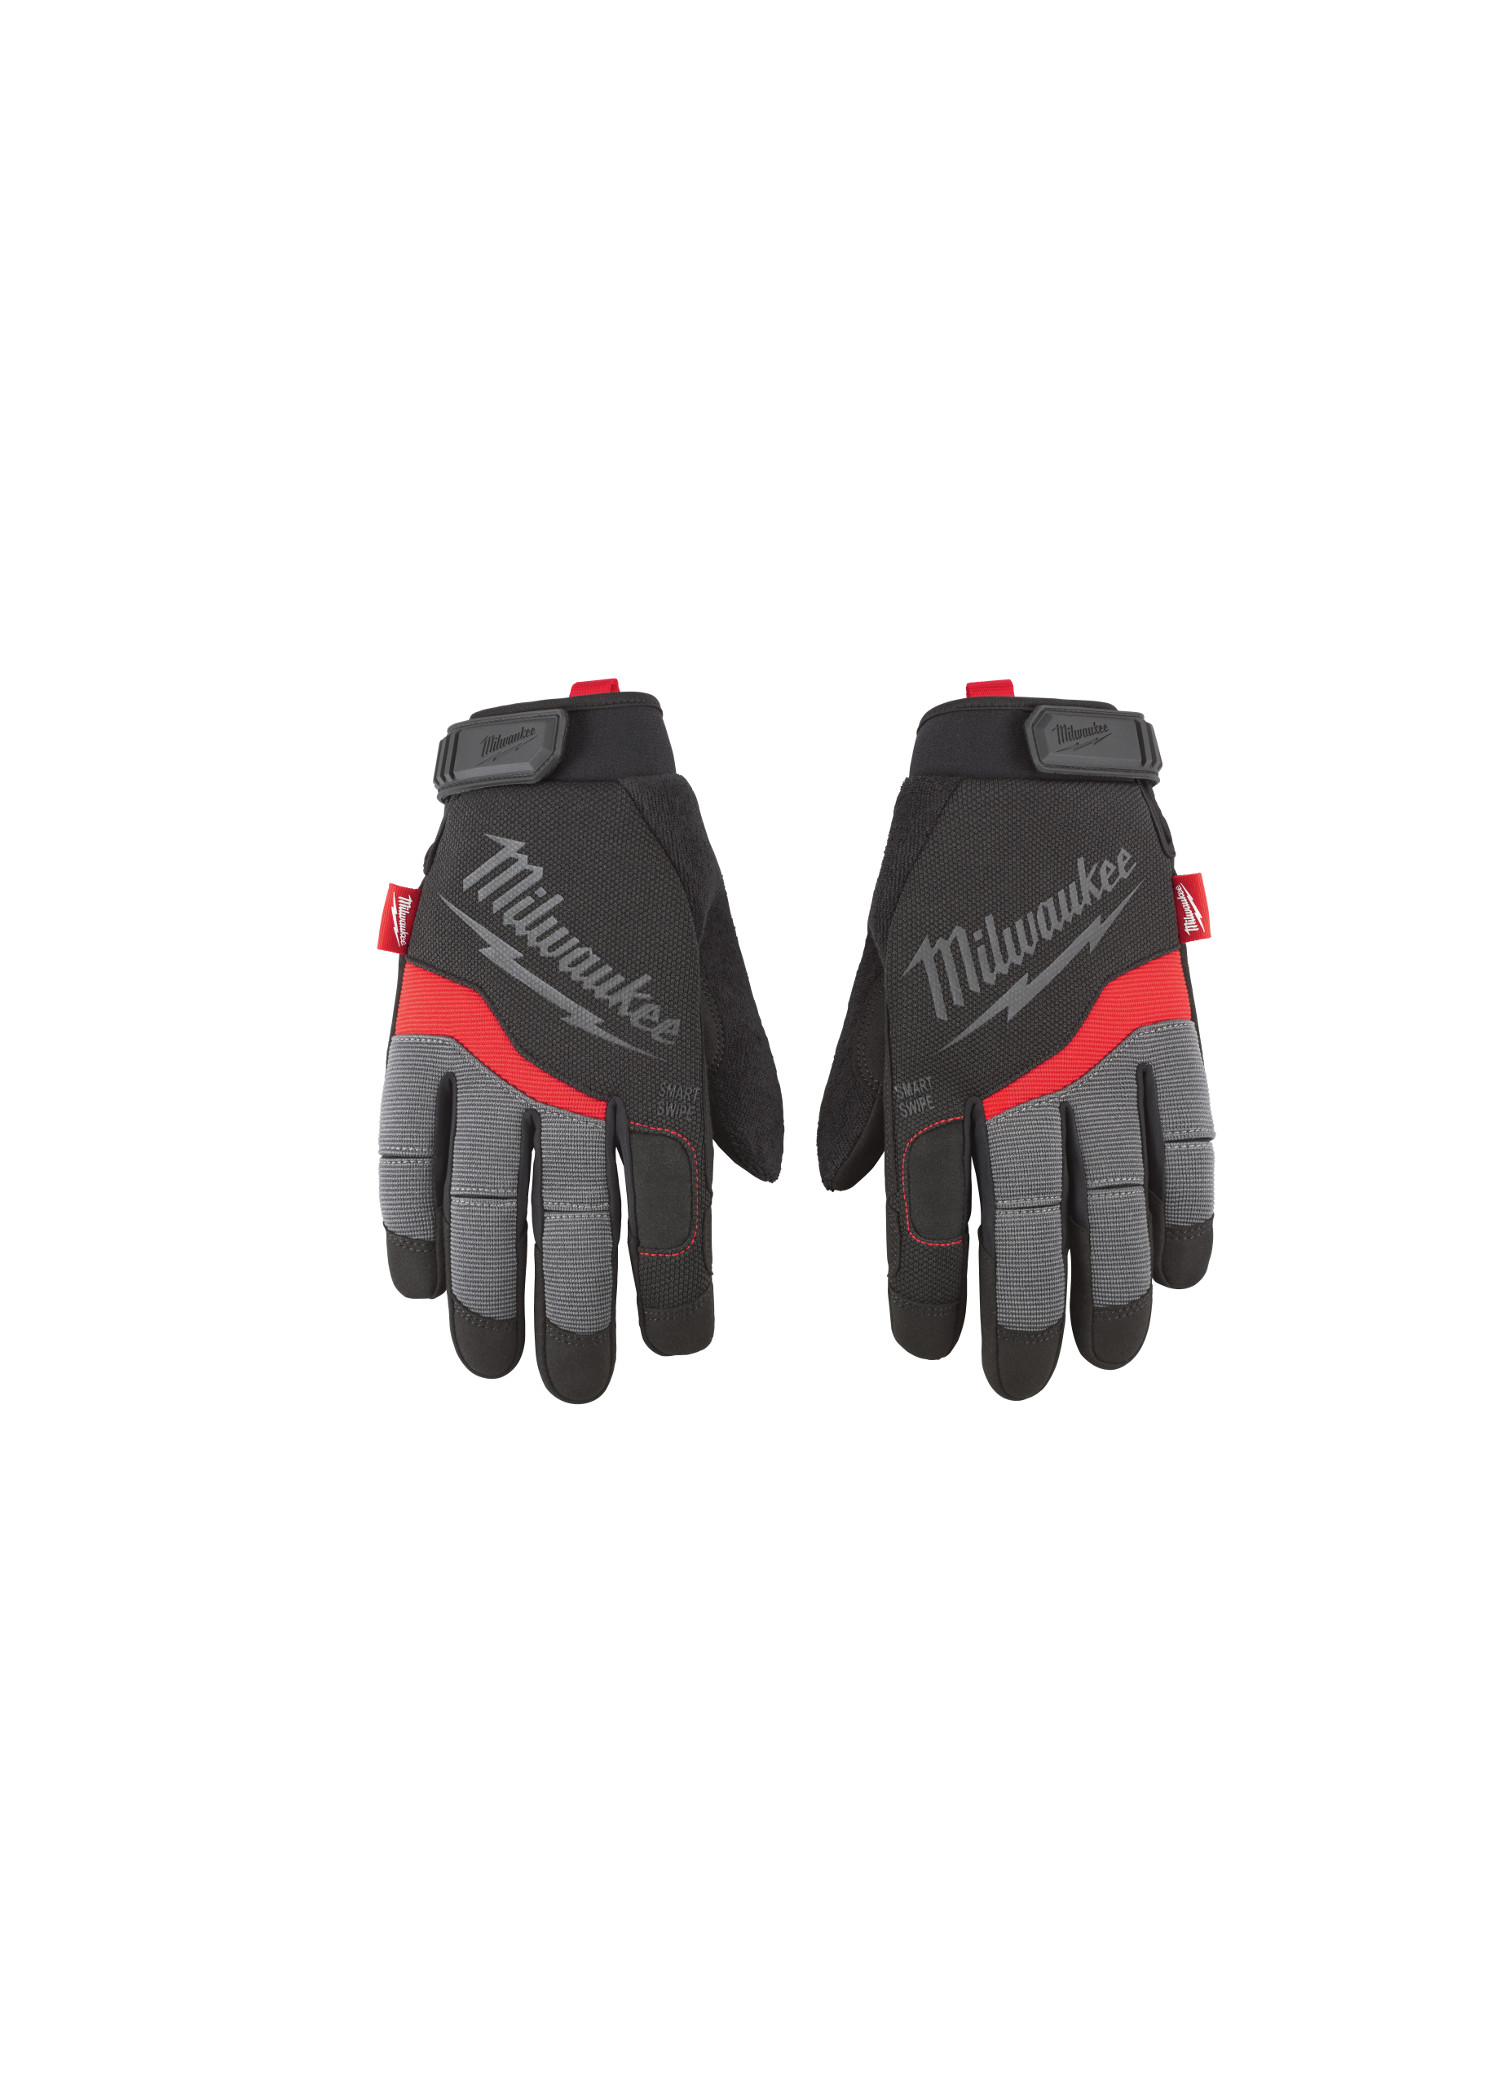 Milwaukee 48-22-8722 Performance Work Gloves - Large